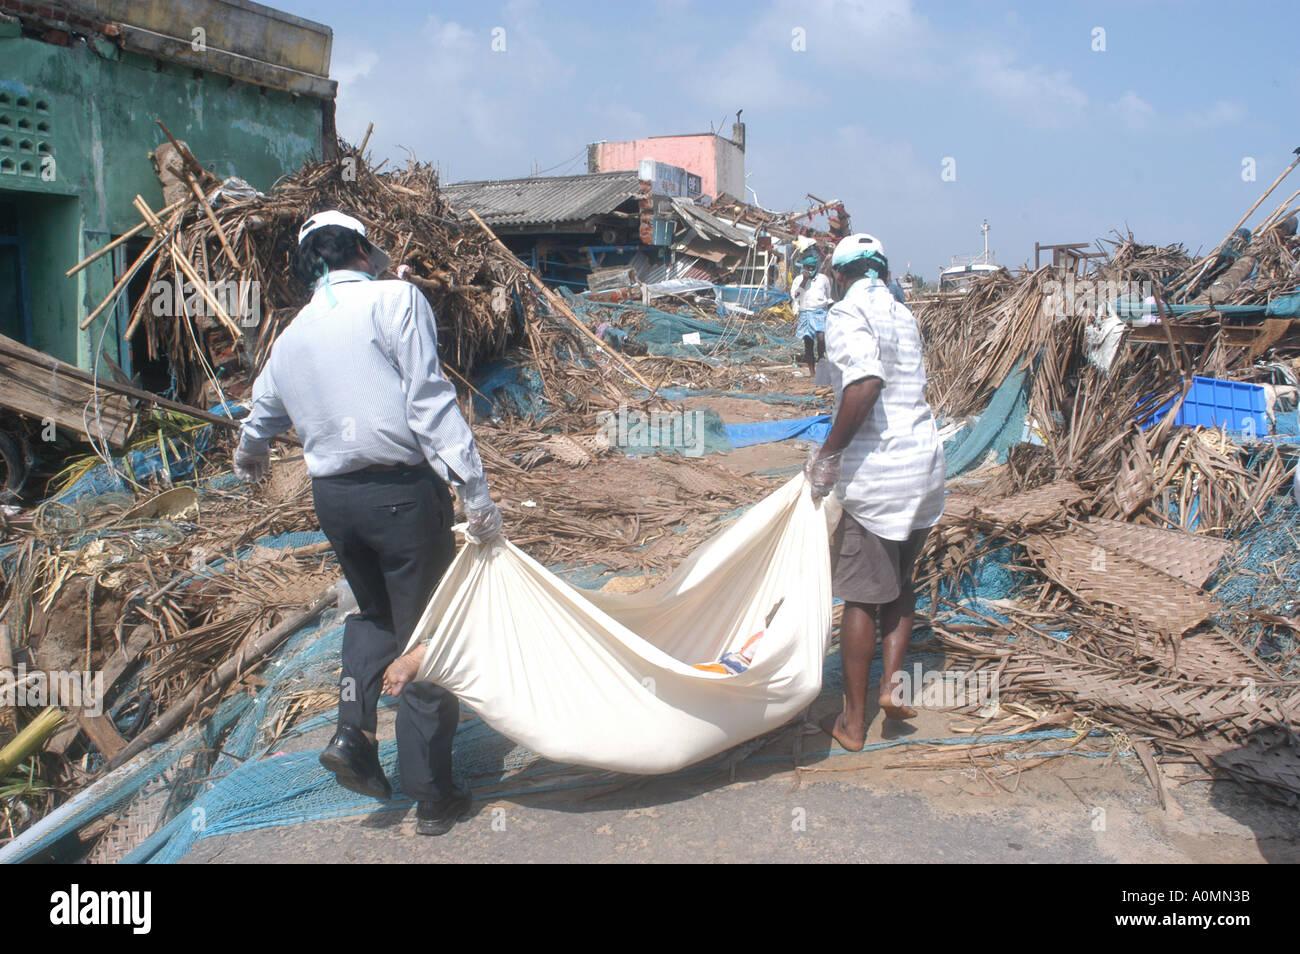 Indian Ocean Earthquake And Tsunami Natural Disaster